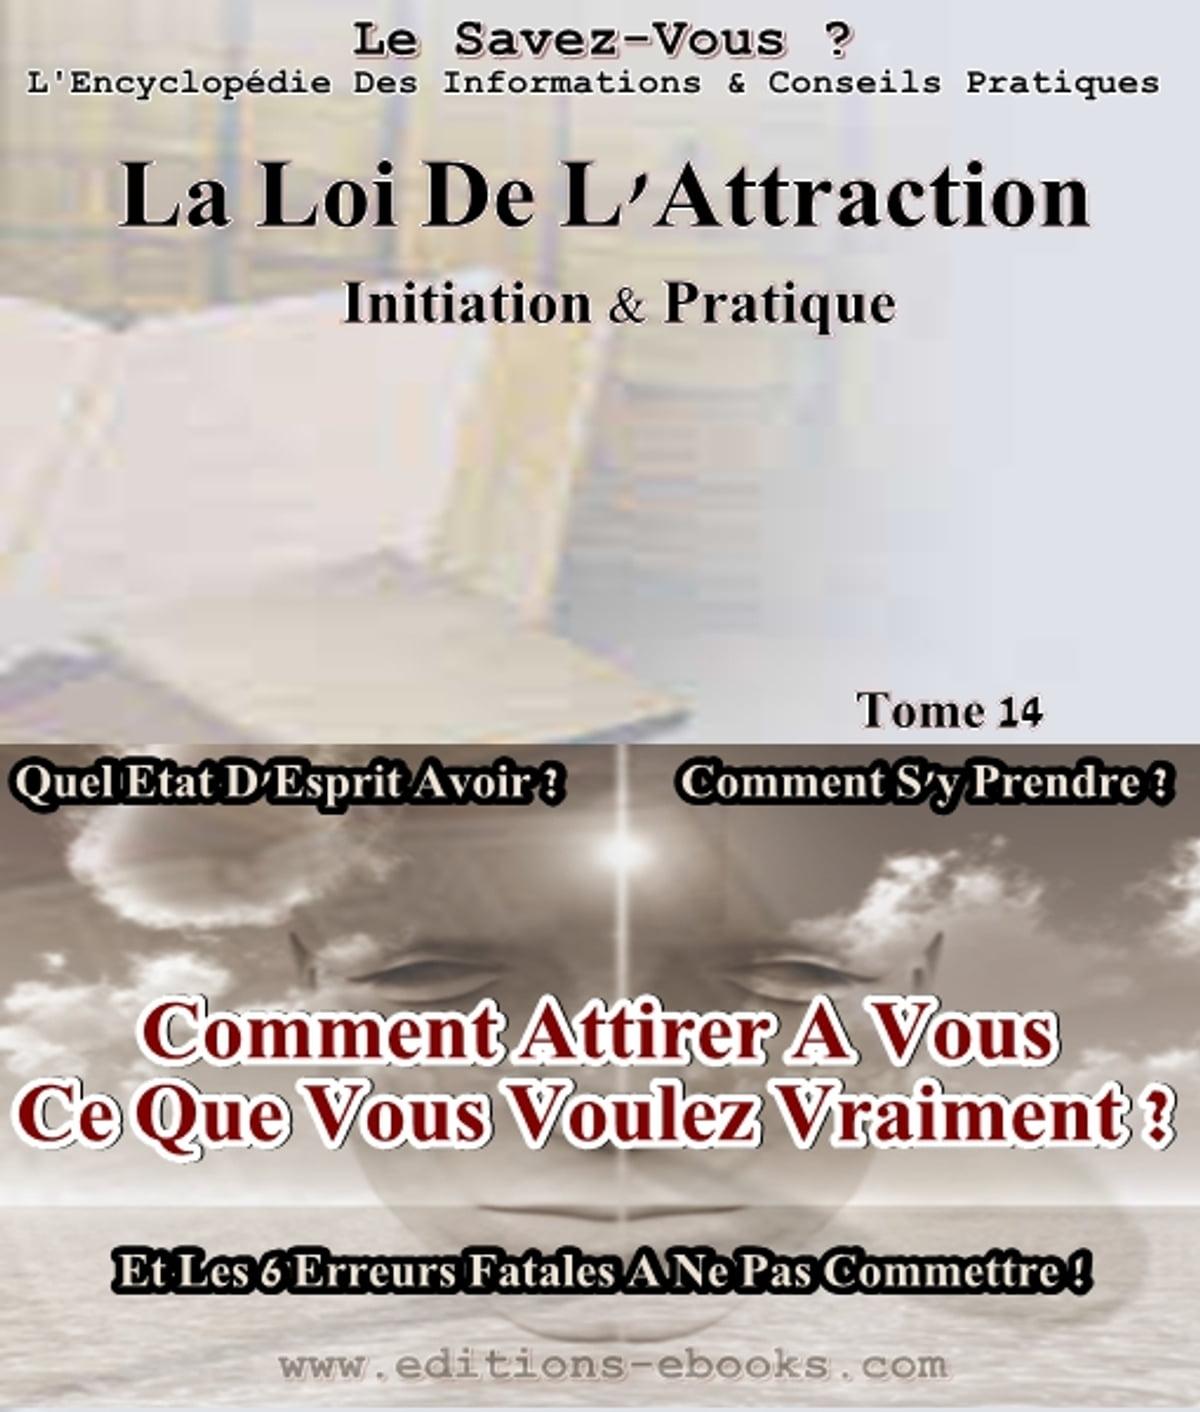 La Loi De L Attraction Initiation Et Pratique Ebook By Collectif Des Editions Ebooks Rakuten Kobo